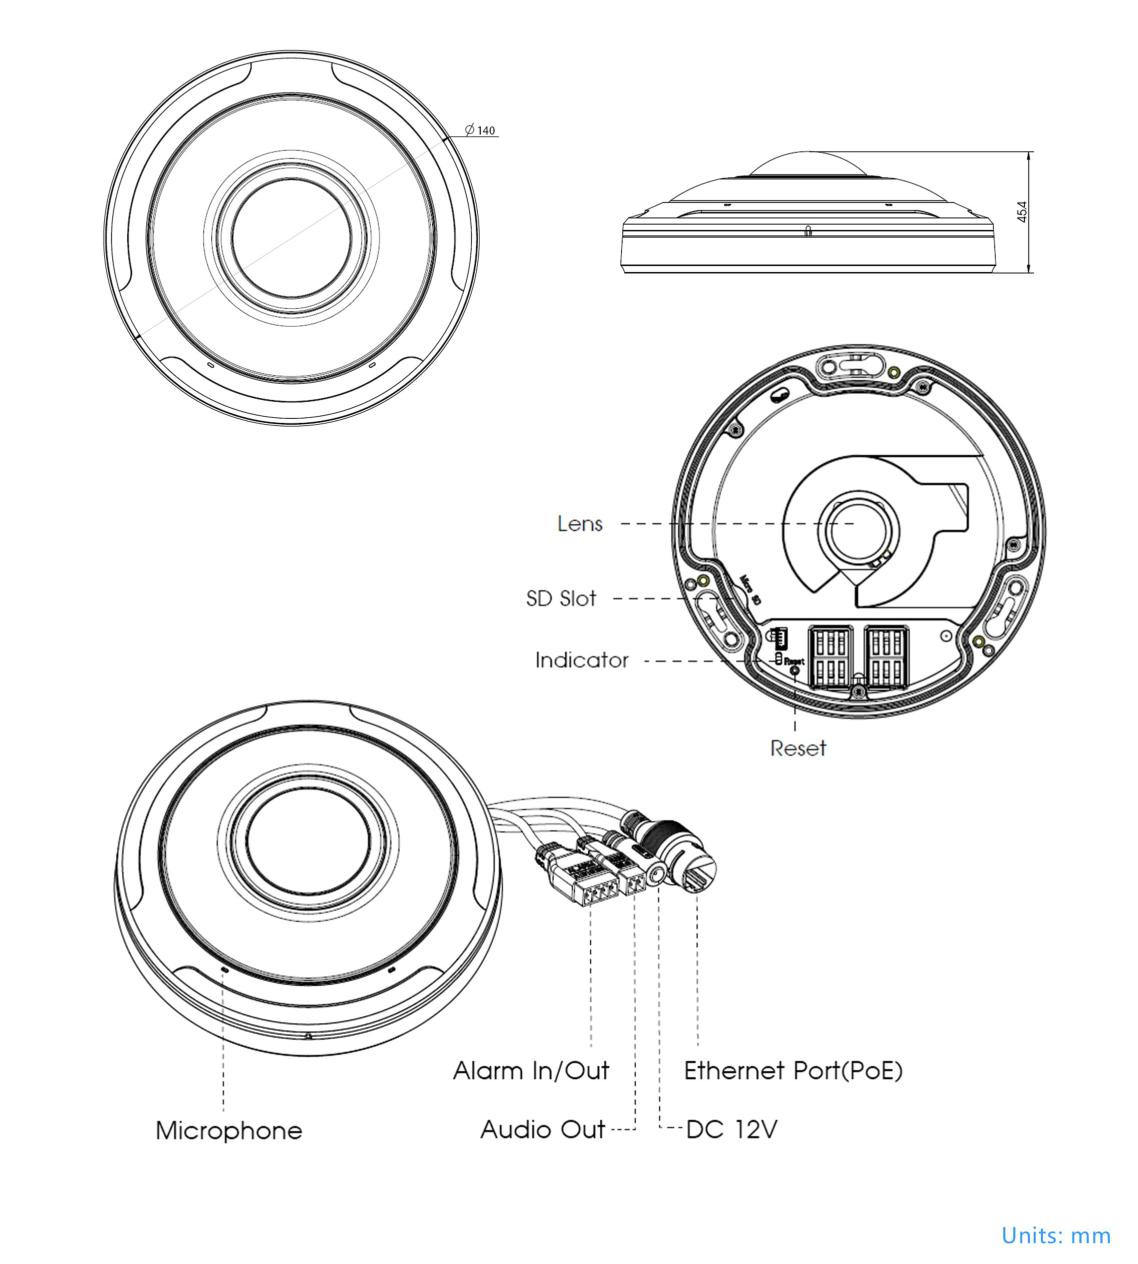 Milesight Fisheye Dimensions